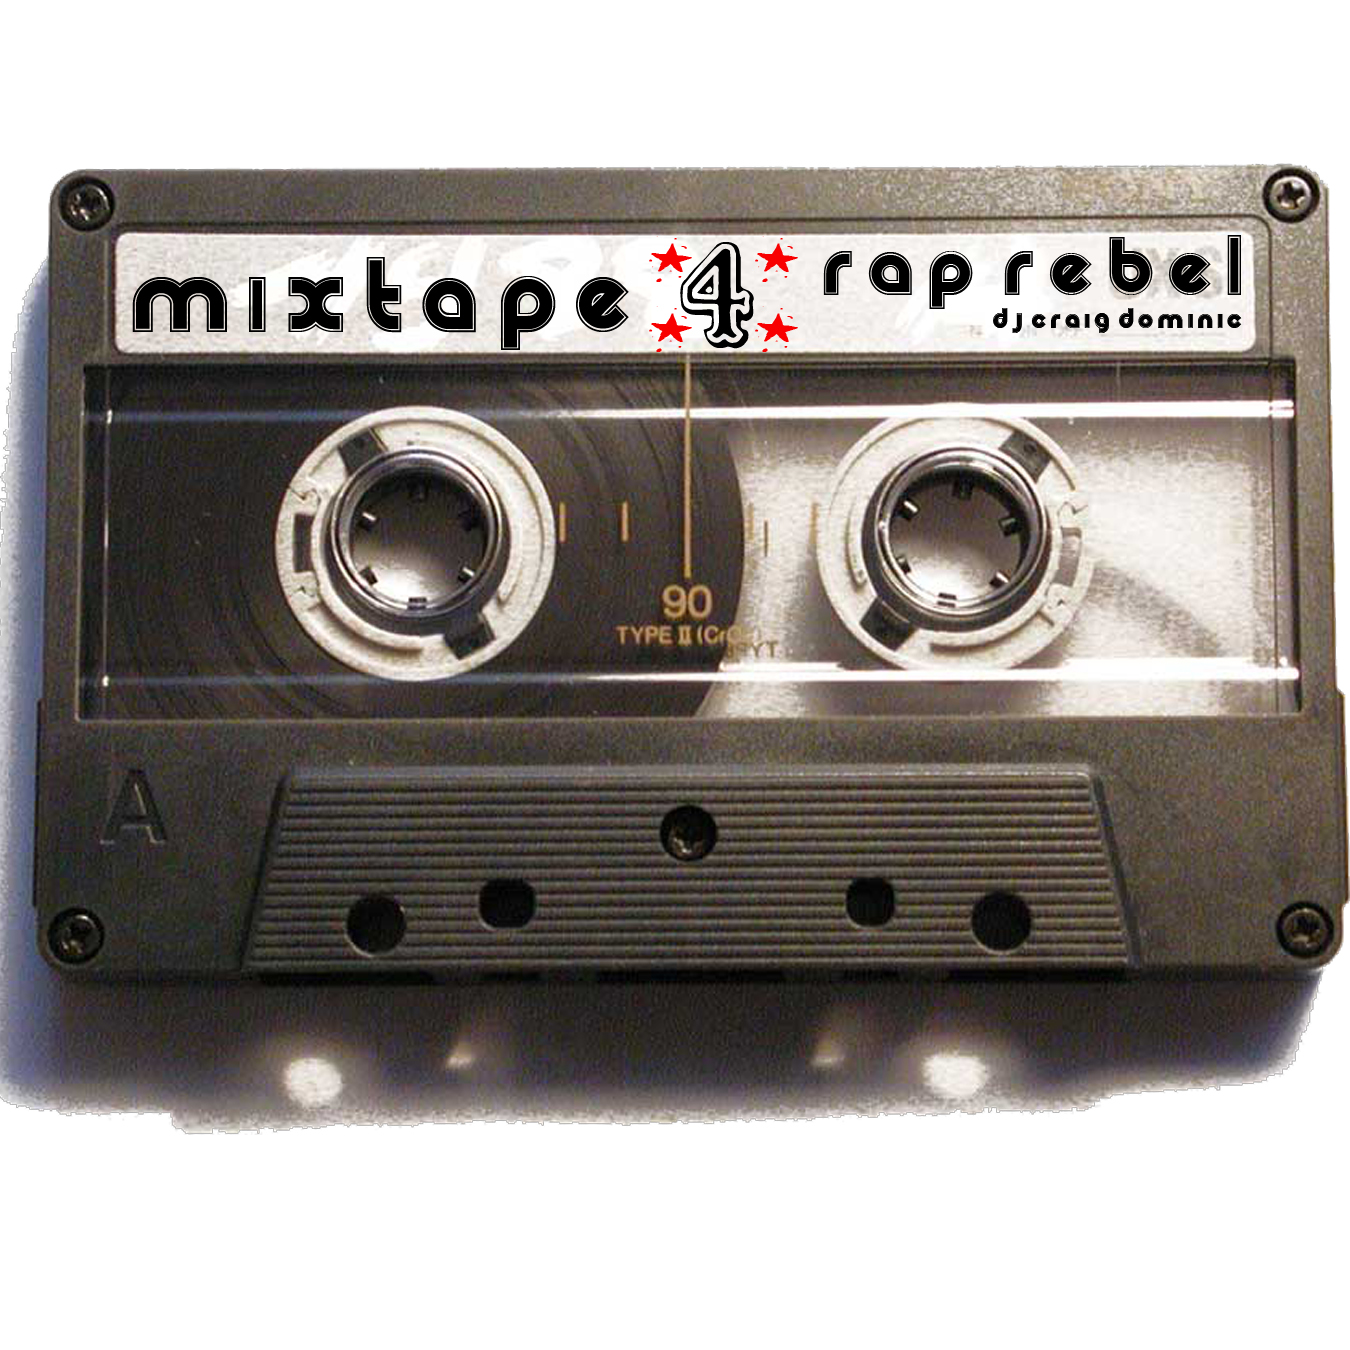 http://3.bp.blogspot.com/-N7T9dD3rlwg/TswGJMrciuI/AAAAAAAAAIo/2I6D5isbP6w/s1600/mixtape+4.jpg